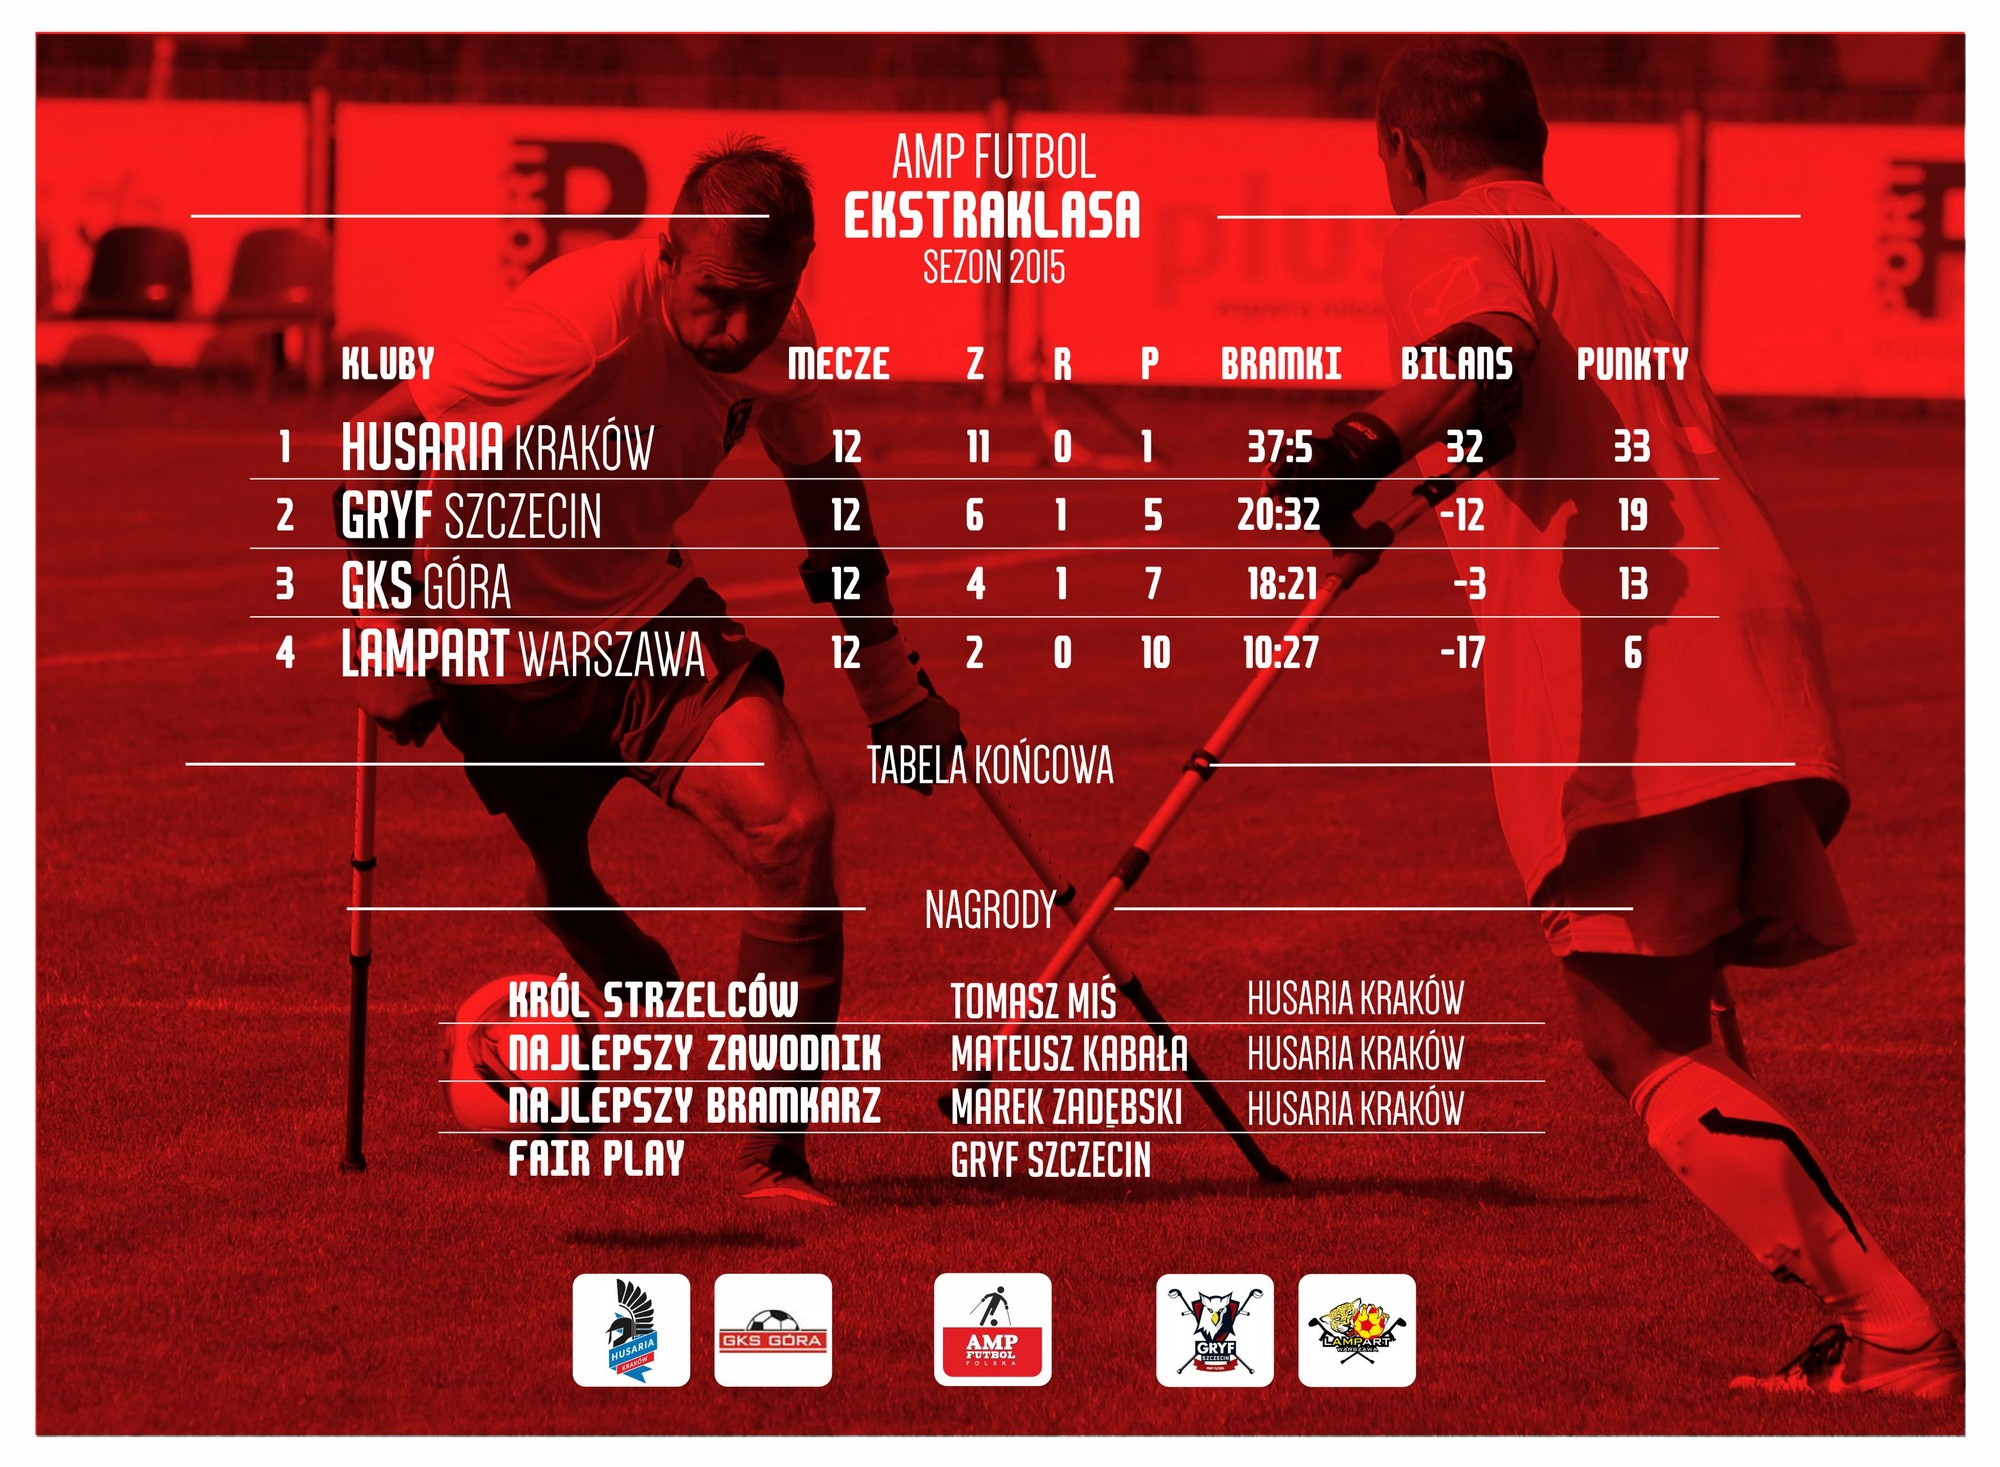 Amp Futbol Ekstraklasa 2015